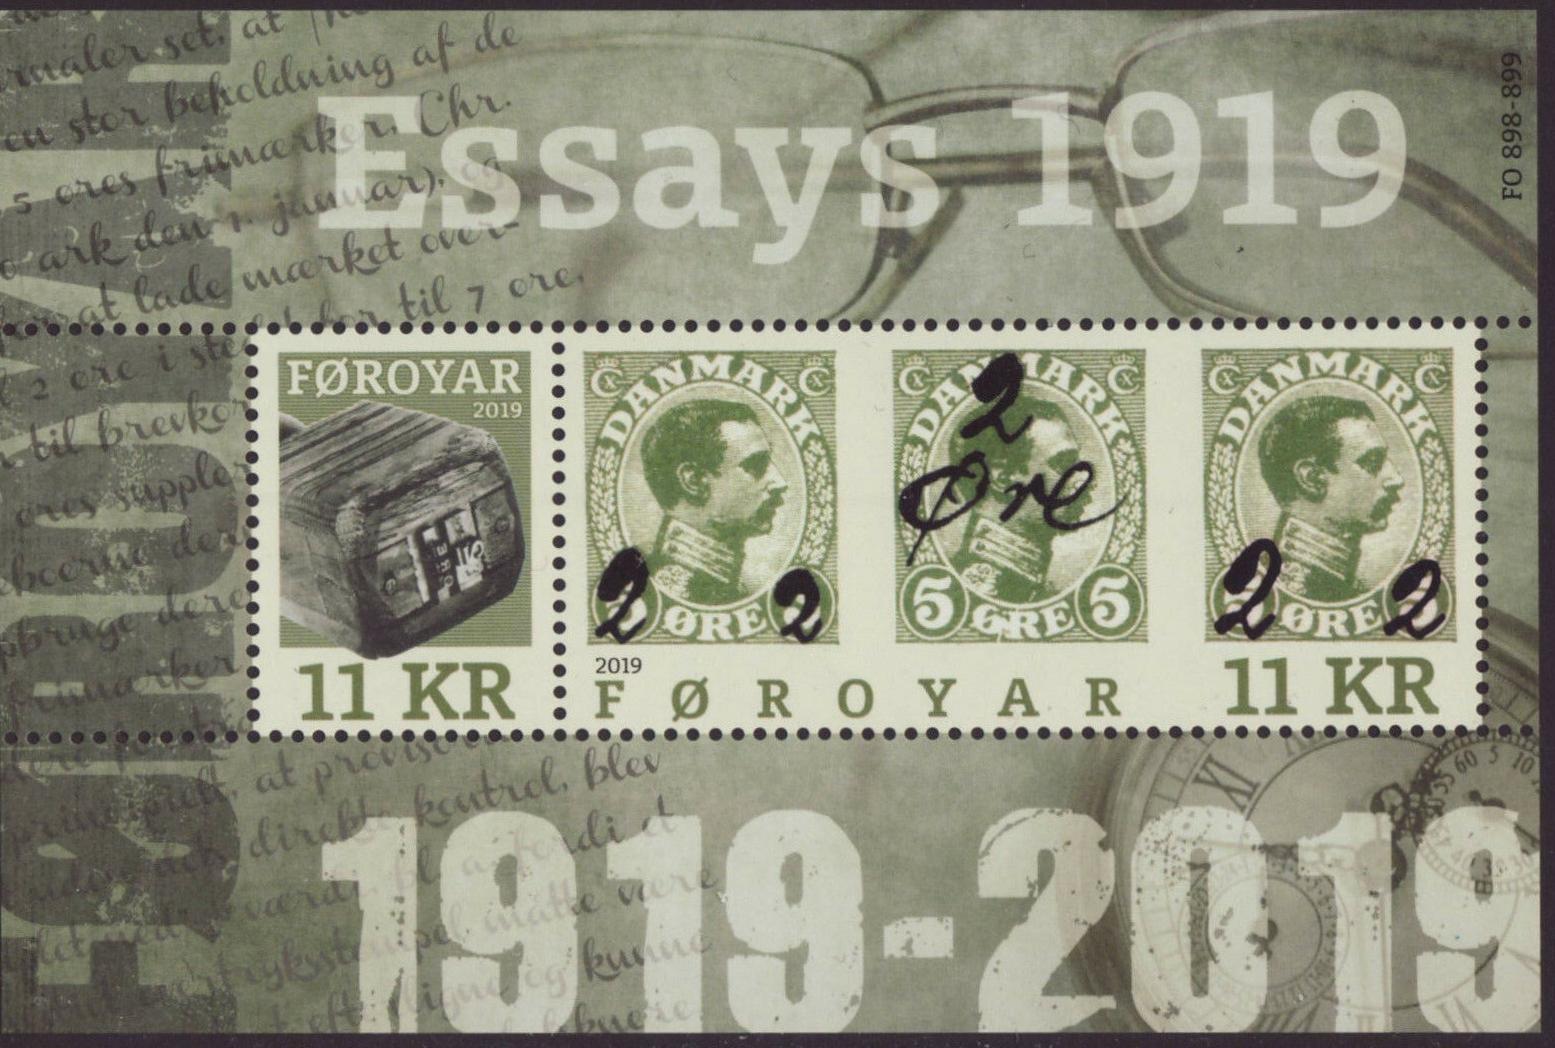 Faroe Islands - Provisional Stamps 1919 (January 11, 2019) miniature sheet of 2